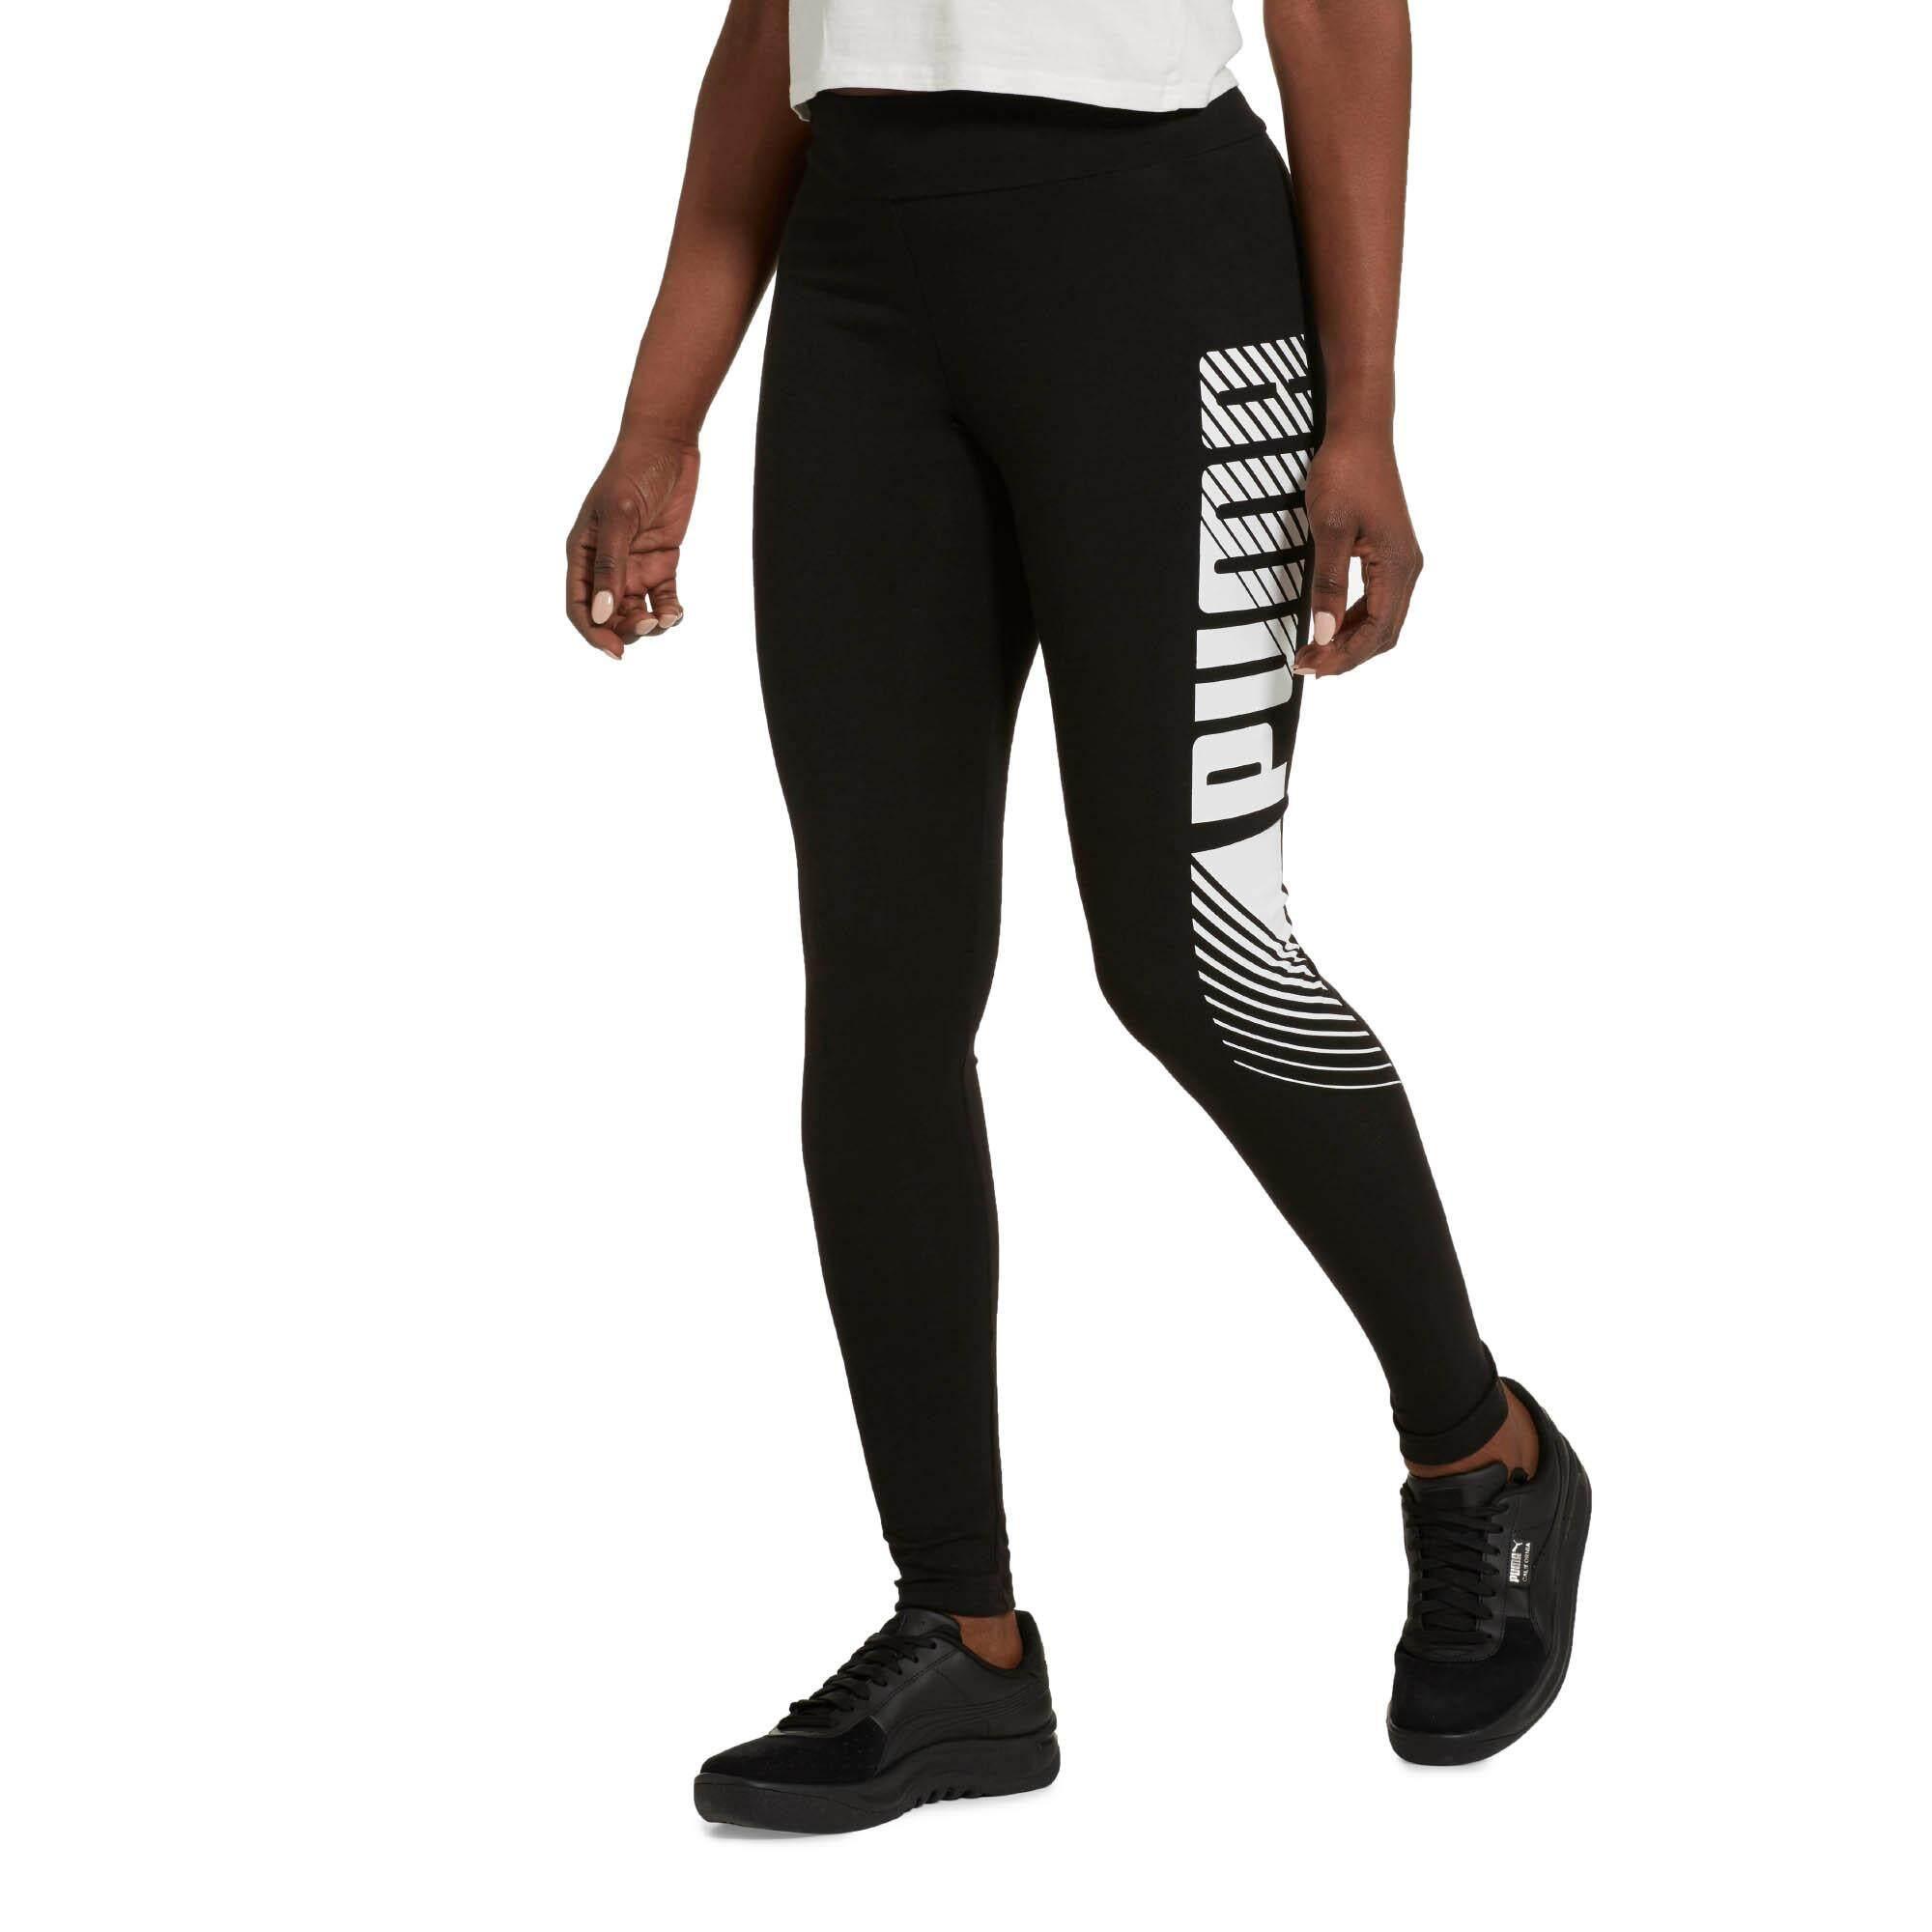 b27c0901bb2c9f Buy Latest Women Sport Pants | Shorts | Lazada.sg